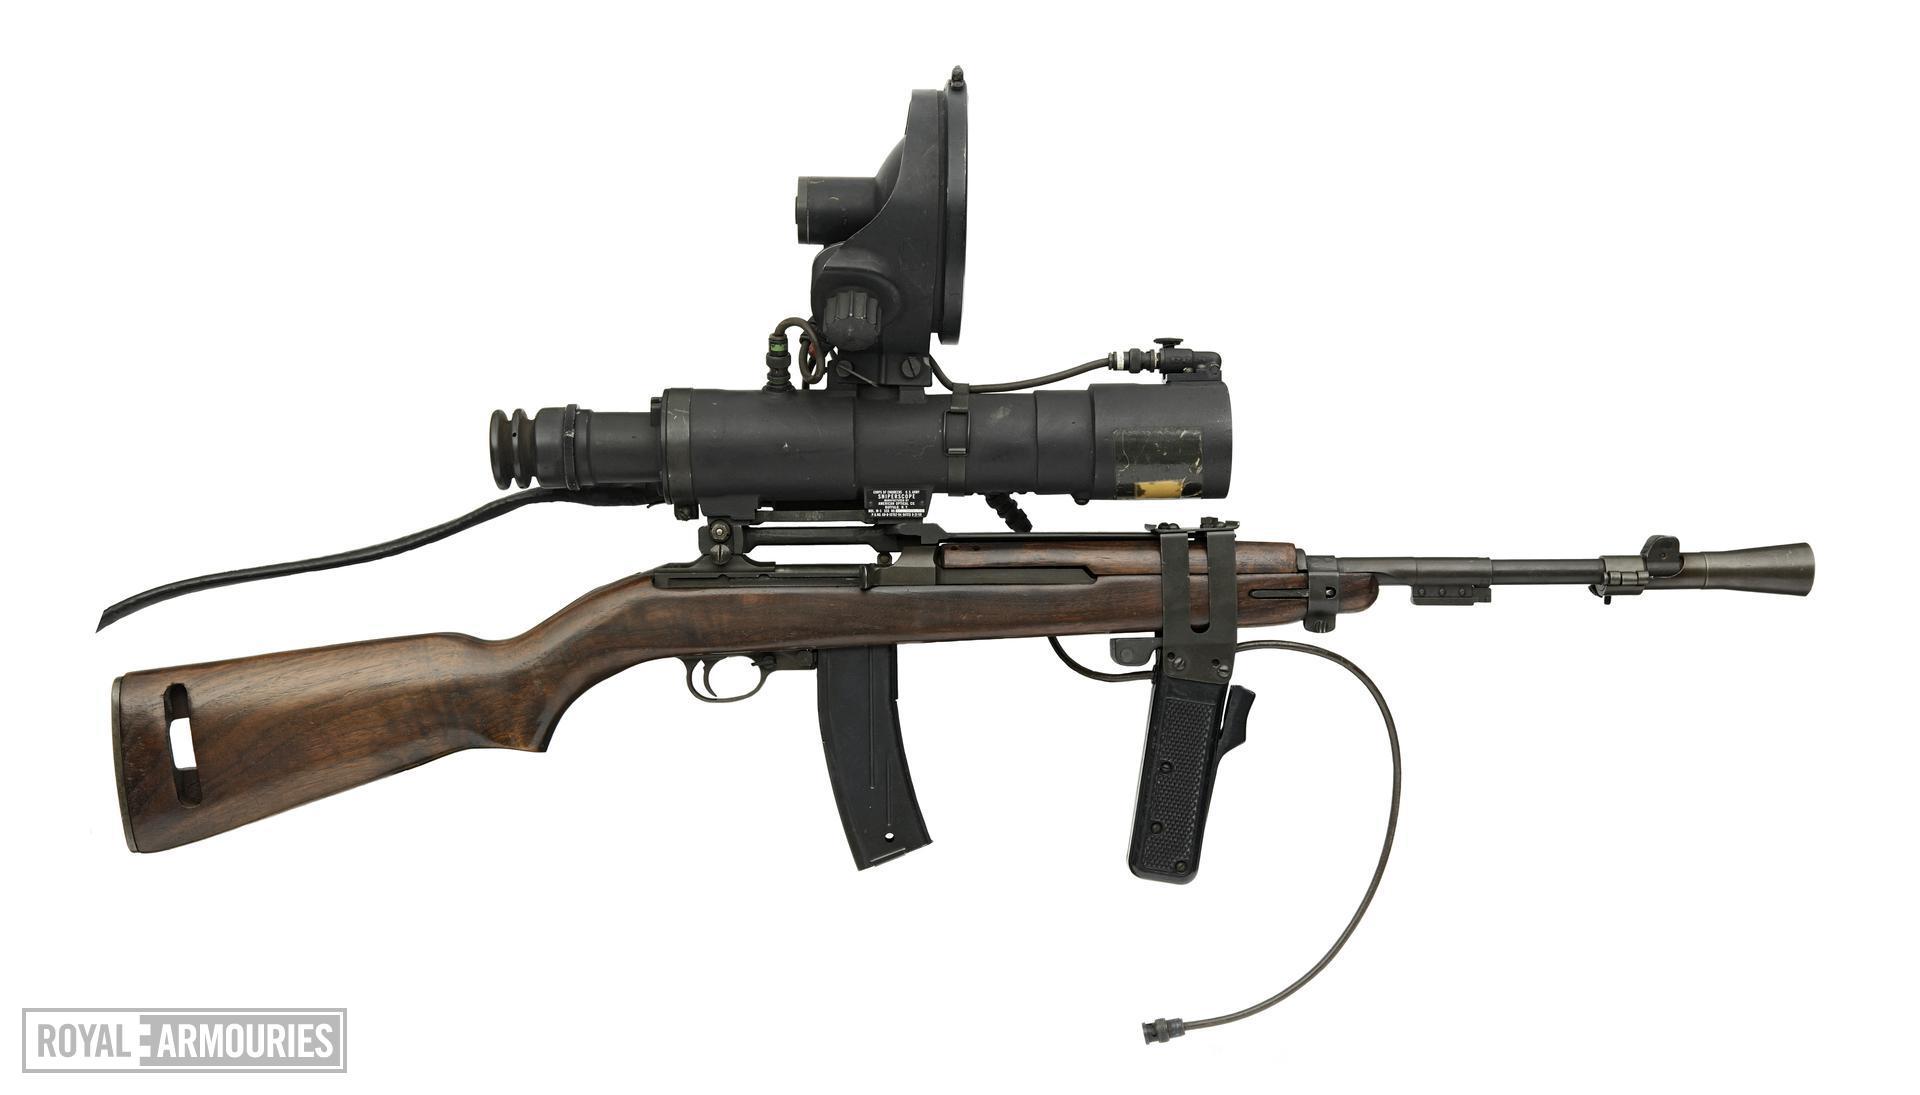 Centrefire automatic carbine - M3